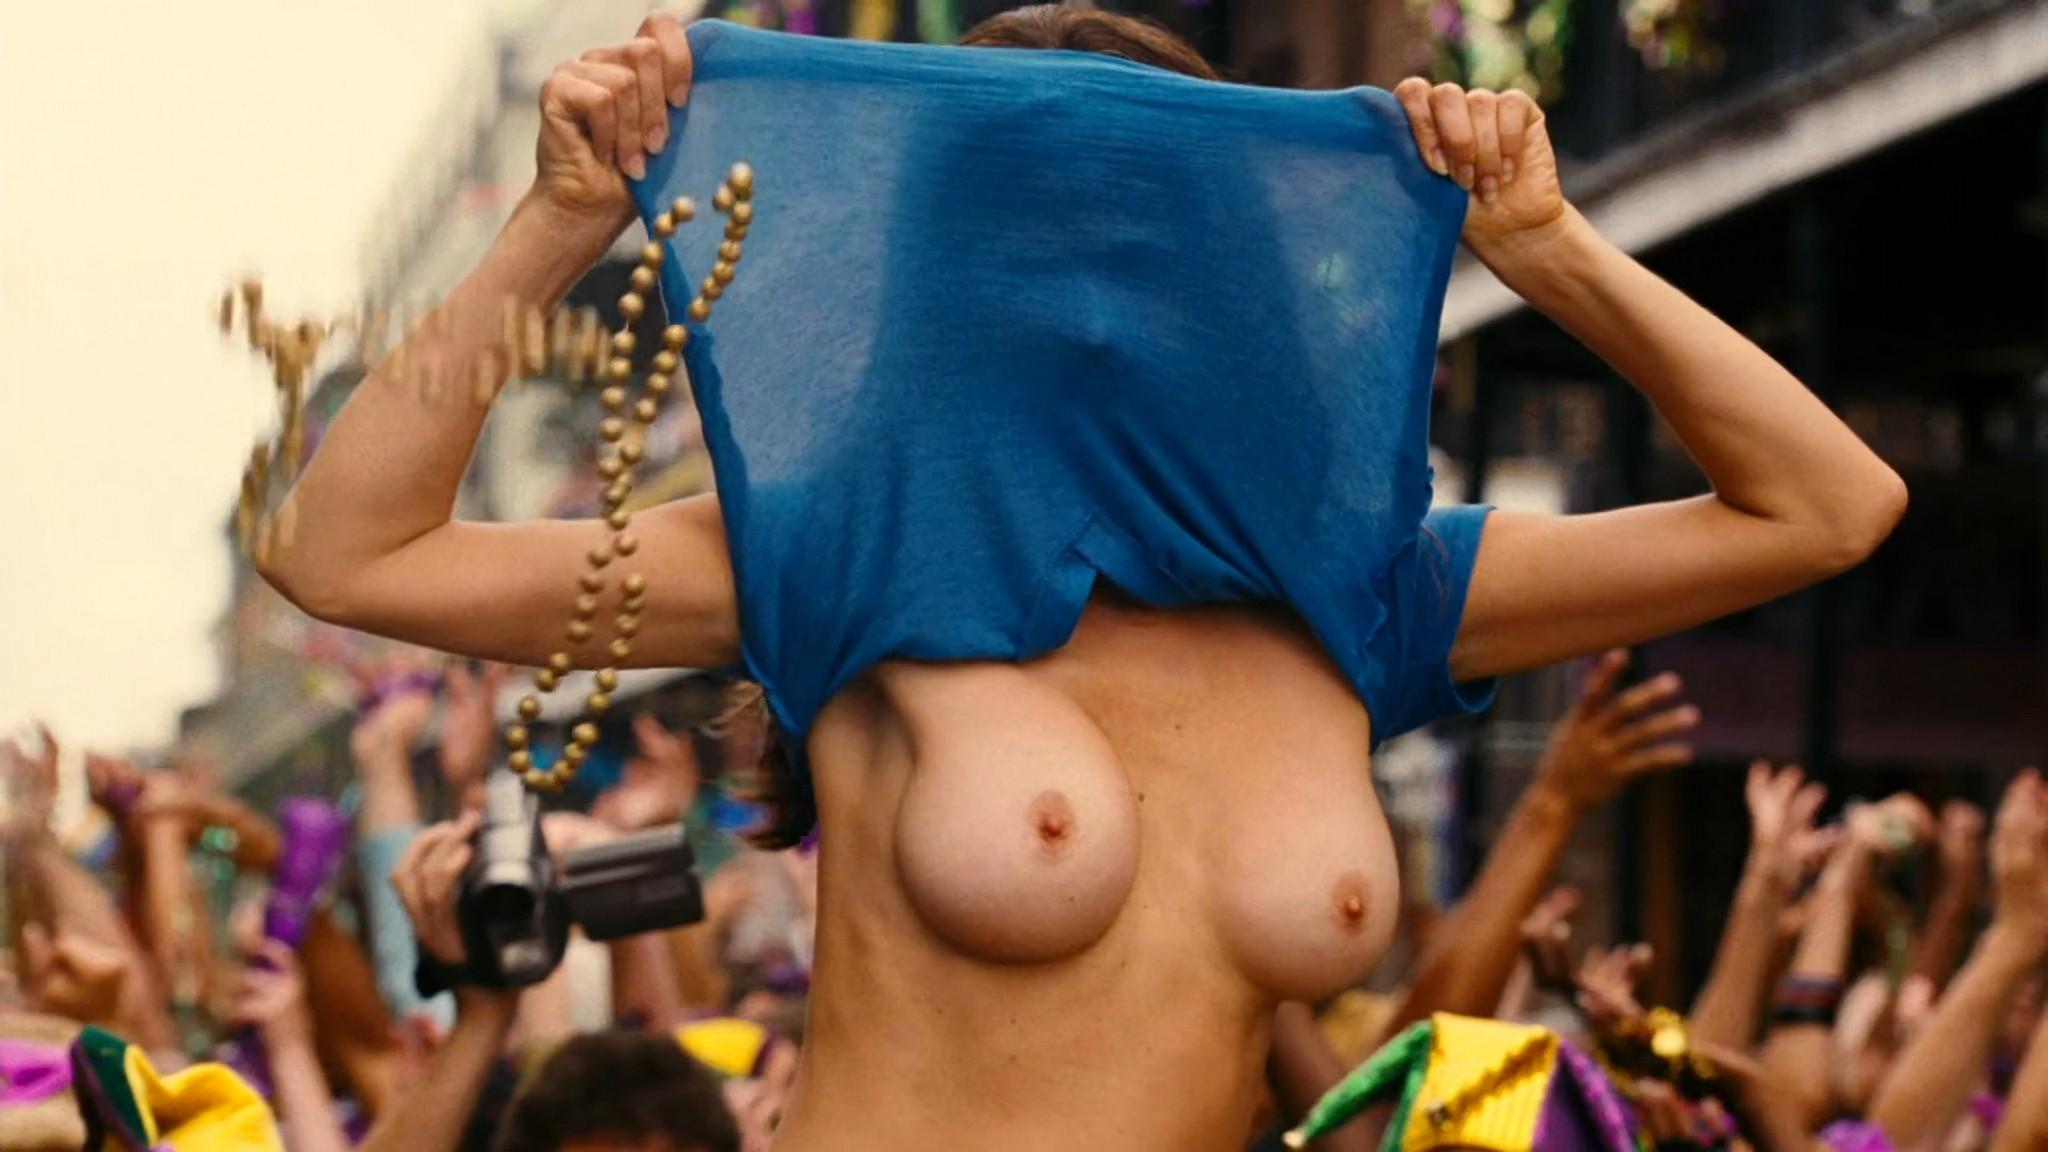 Danneel Ackles nude Carmen Electra, Arielle Kebbel, sexy otherrs nude and hot - Mardi Gras: Spring Break (2011) HD 1080p WEb (29)